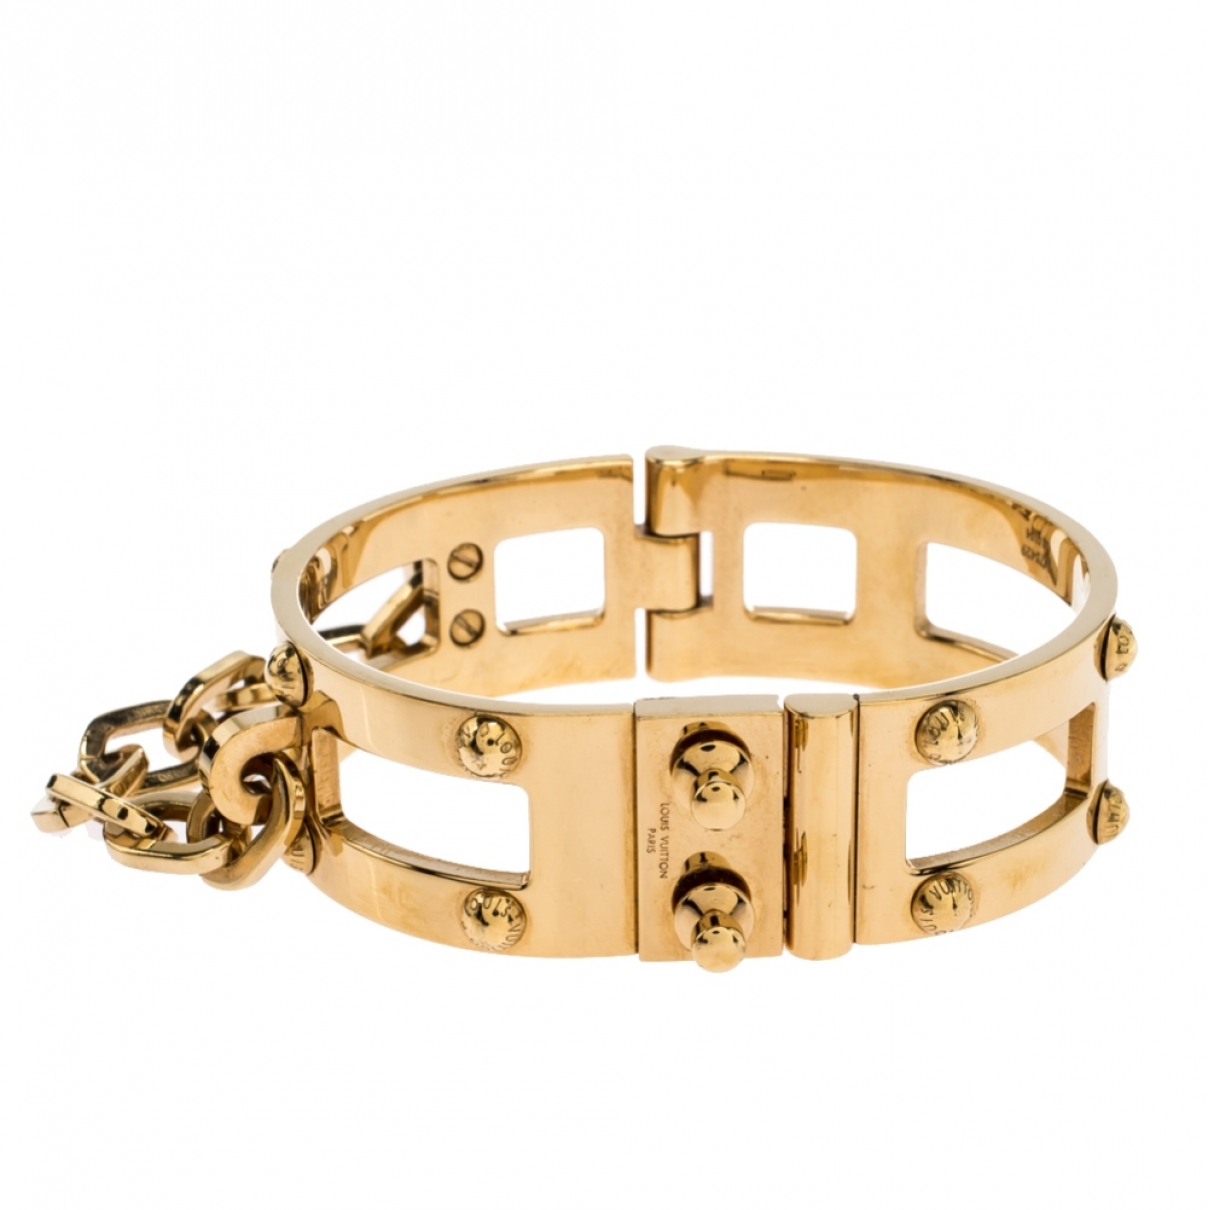 Louis Vuitton \N Gold Metal bracelet for Women \N